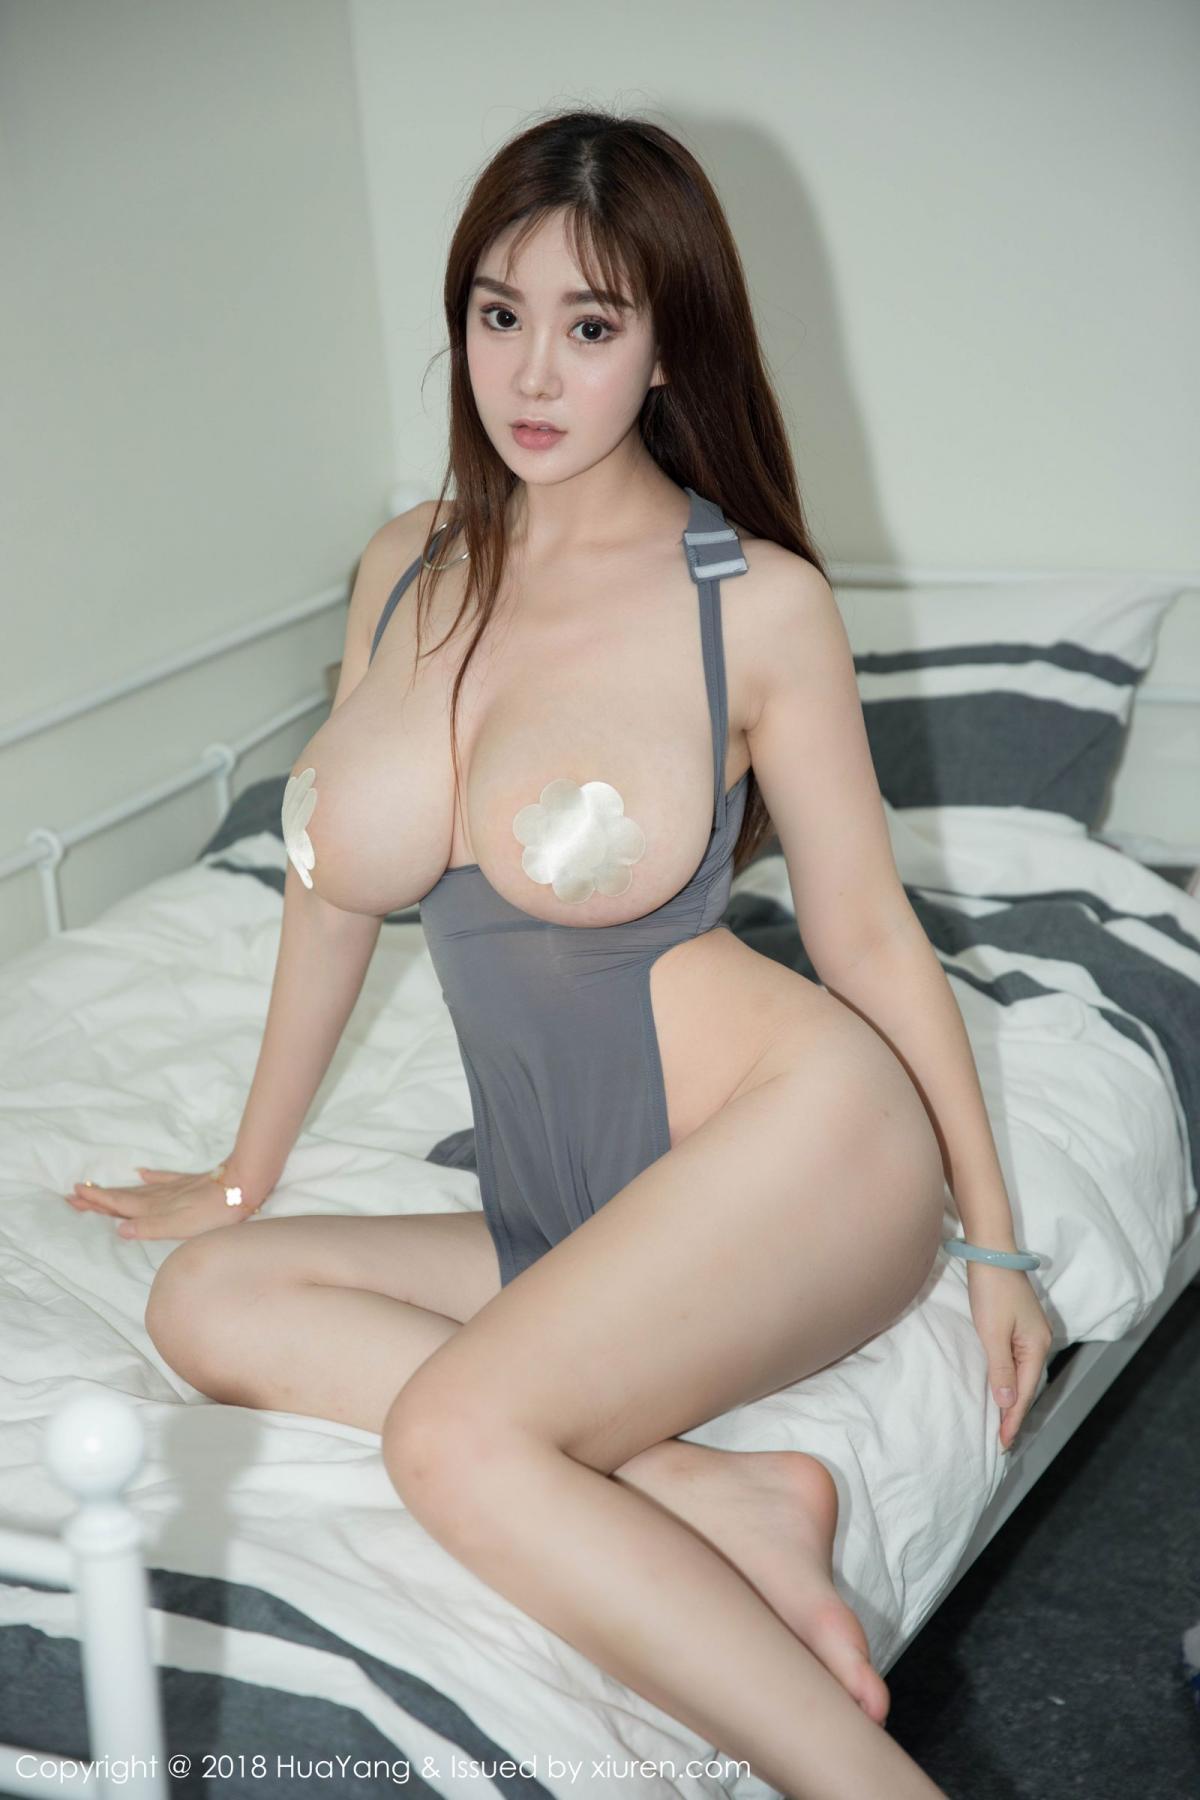 [Huayang] Vol.086 Yi Yang 6P, HuaYang, Mature, Yi Yang